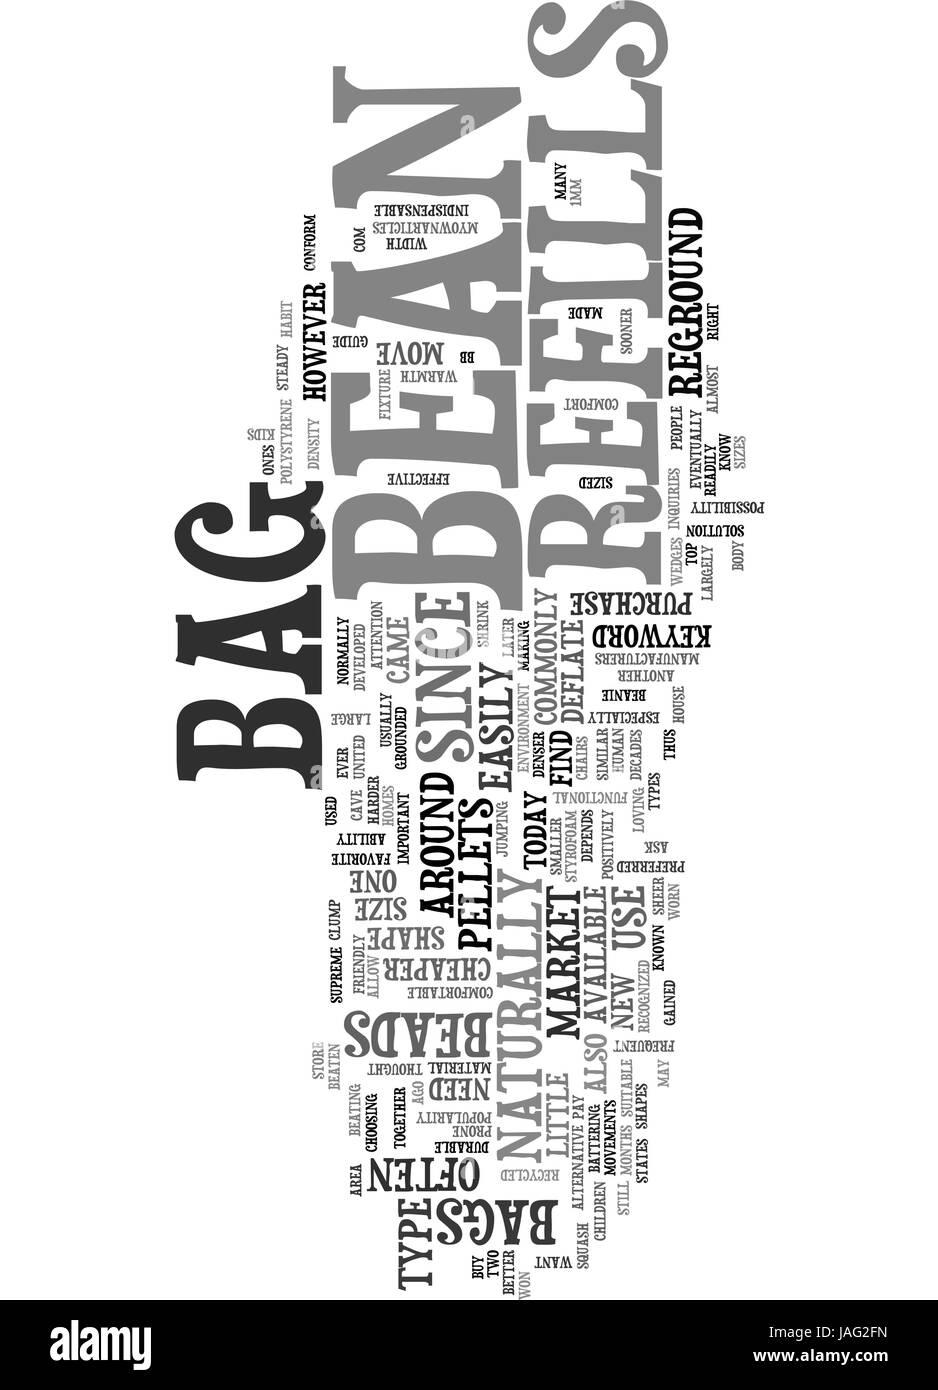 BEAN BAG REFILLS TEXT WORD CLOUD CONCEPT - Stock Image